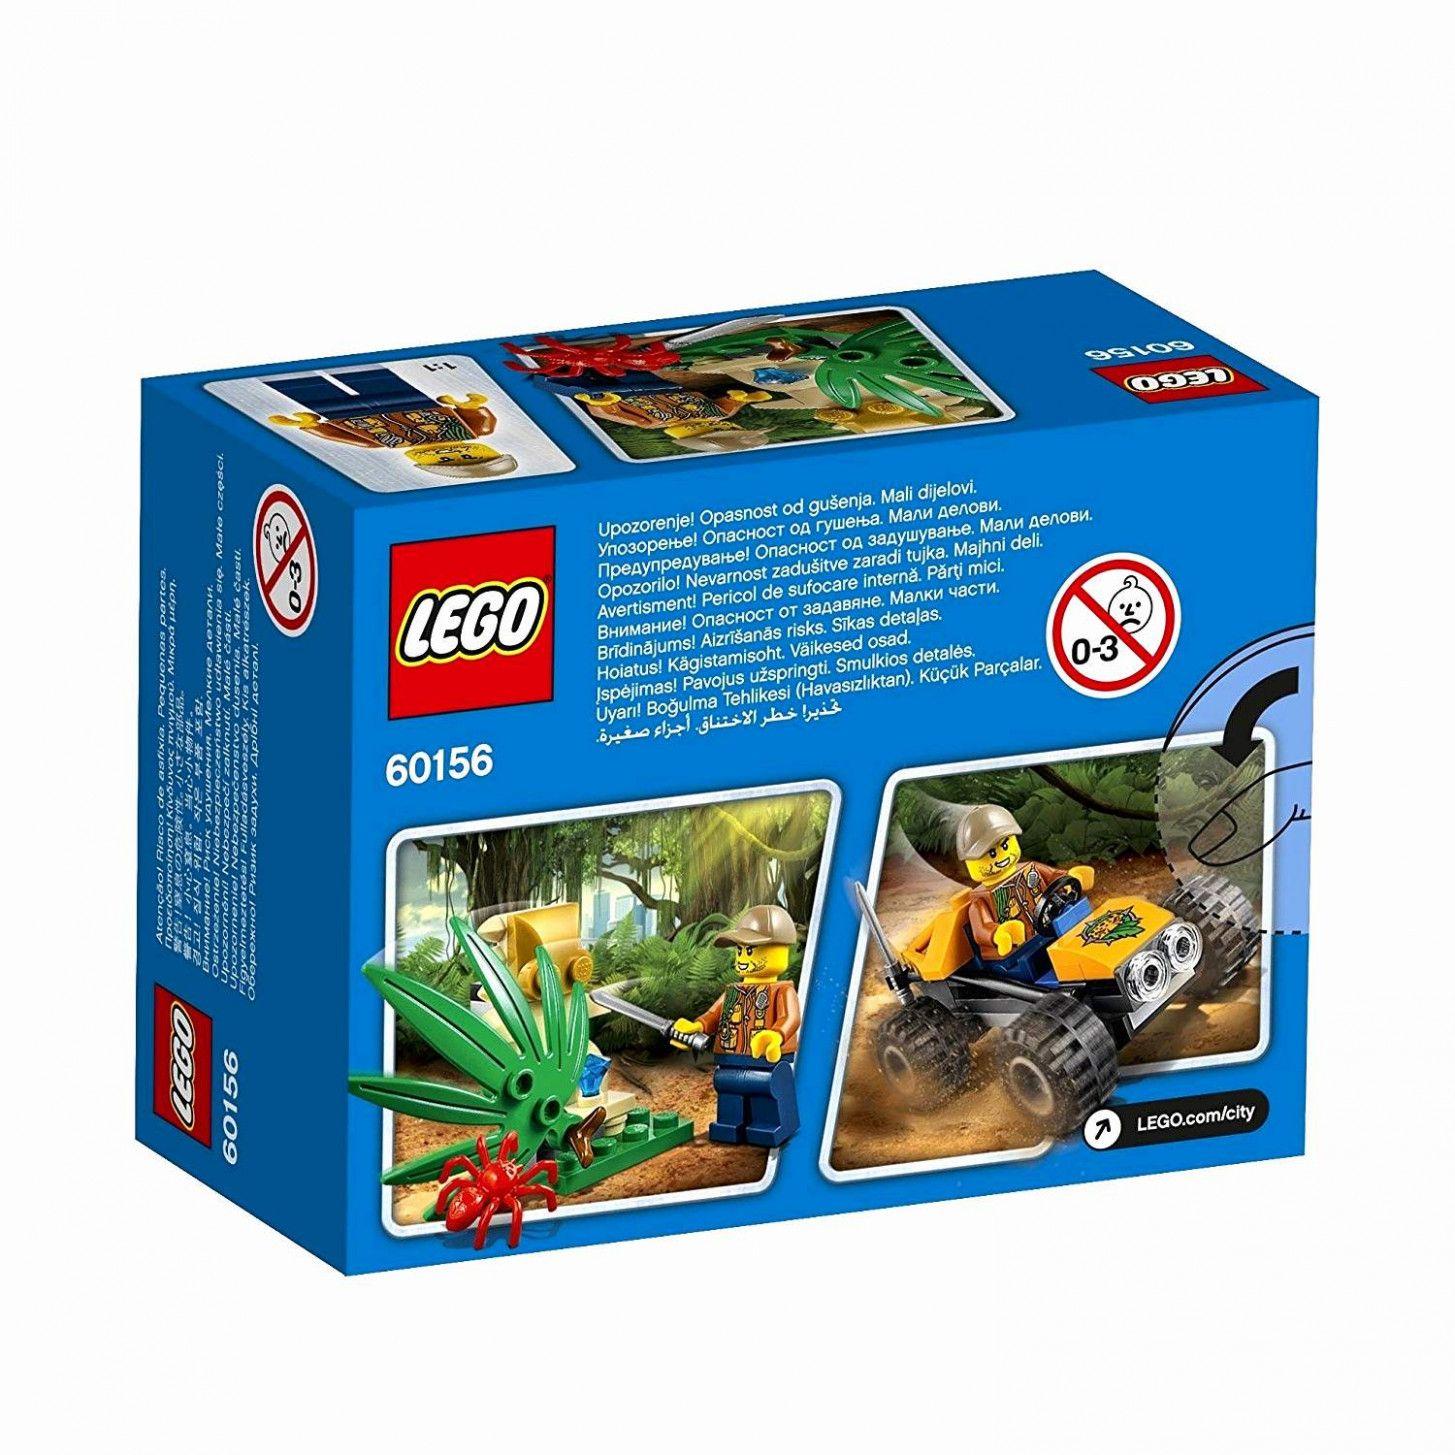 Table De Jardin Magasin Leclerc Lego Lego City Phone Case Cover